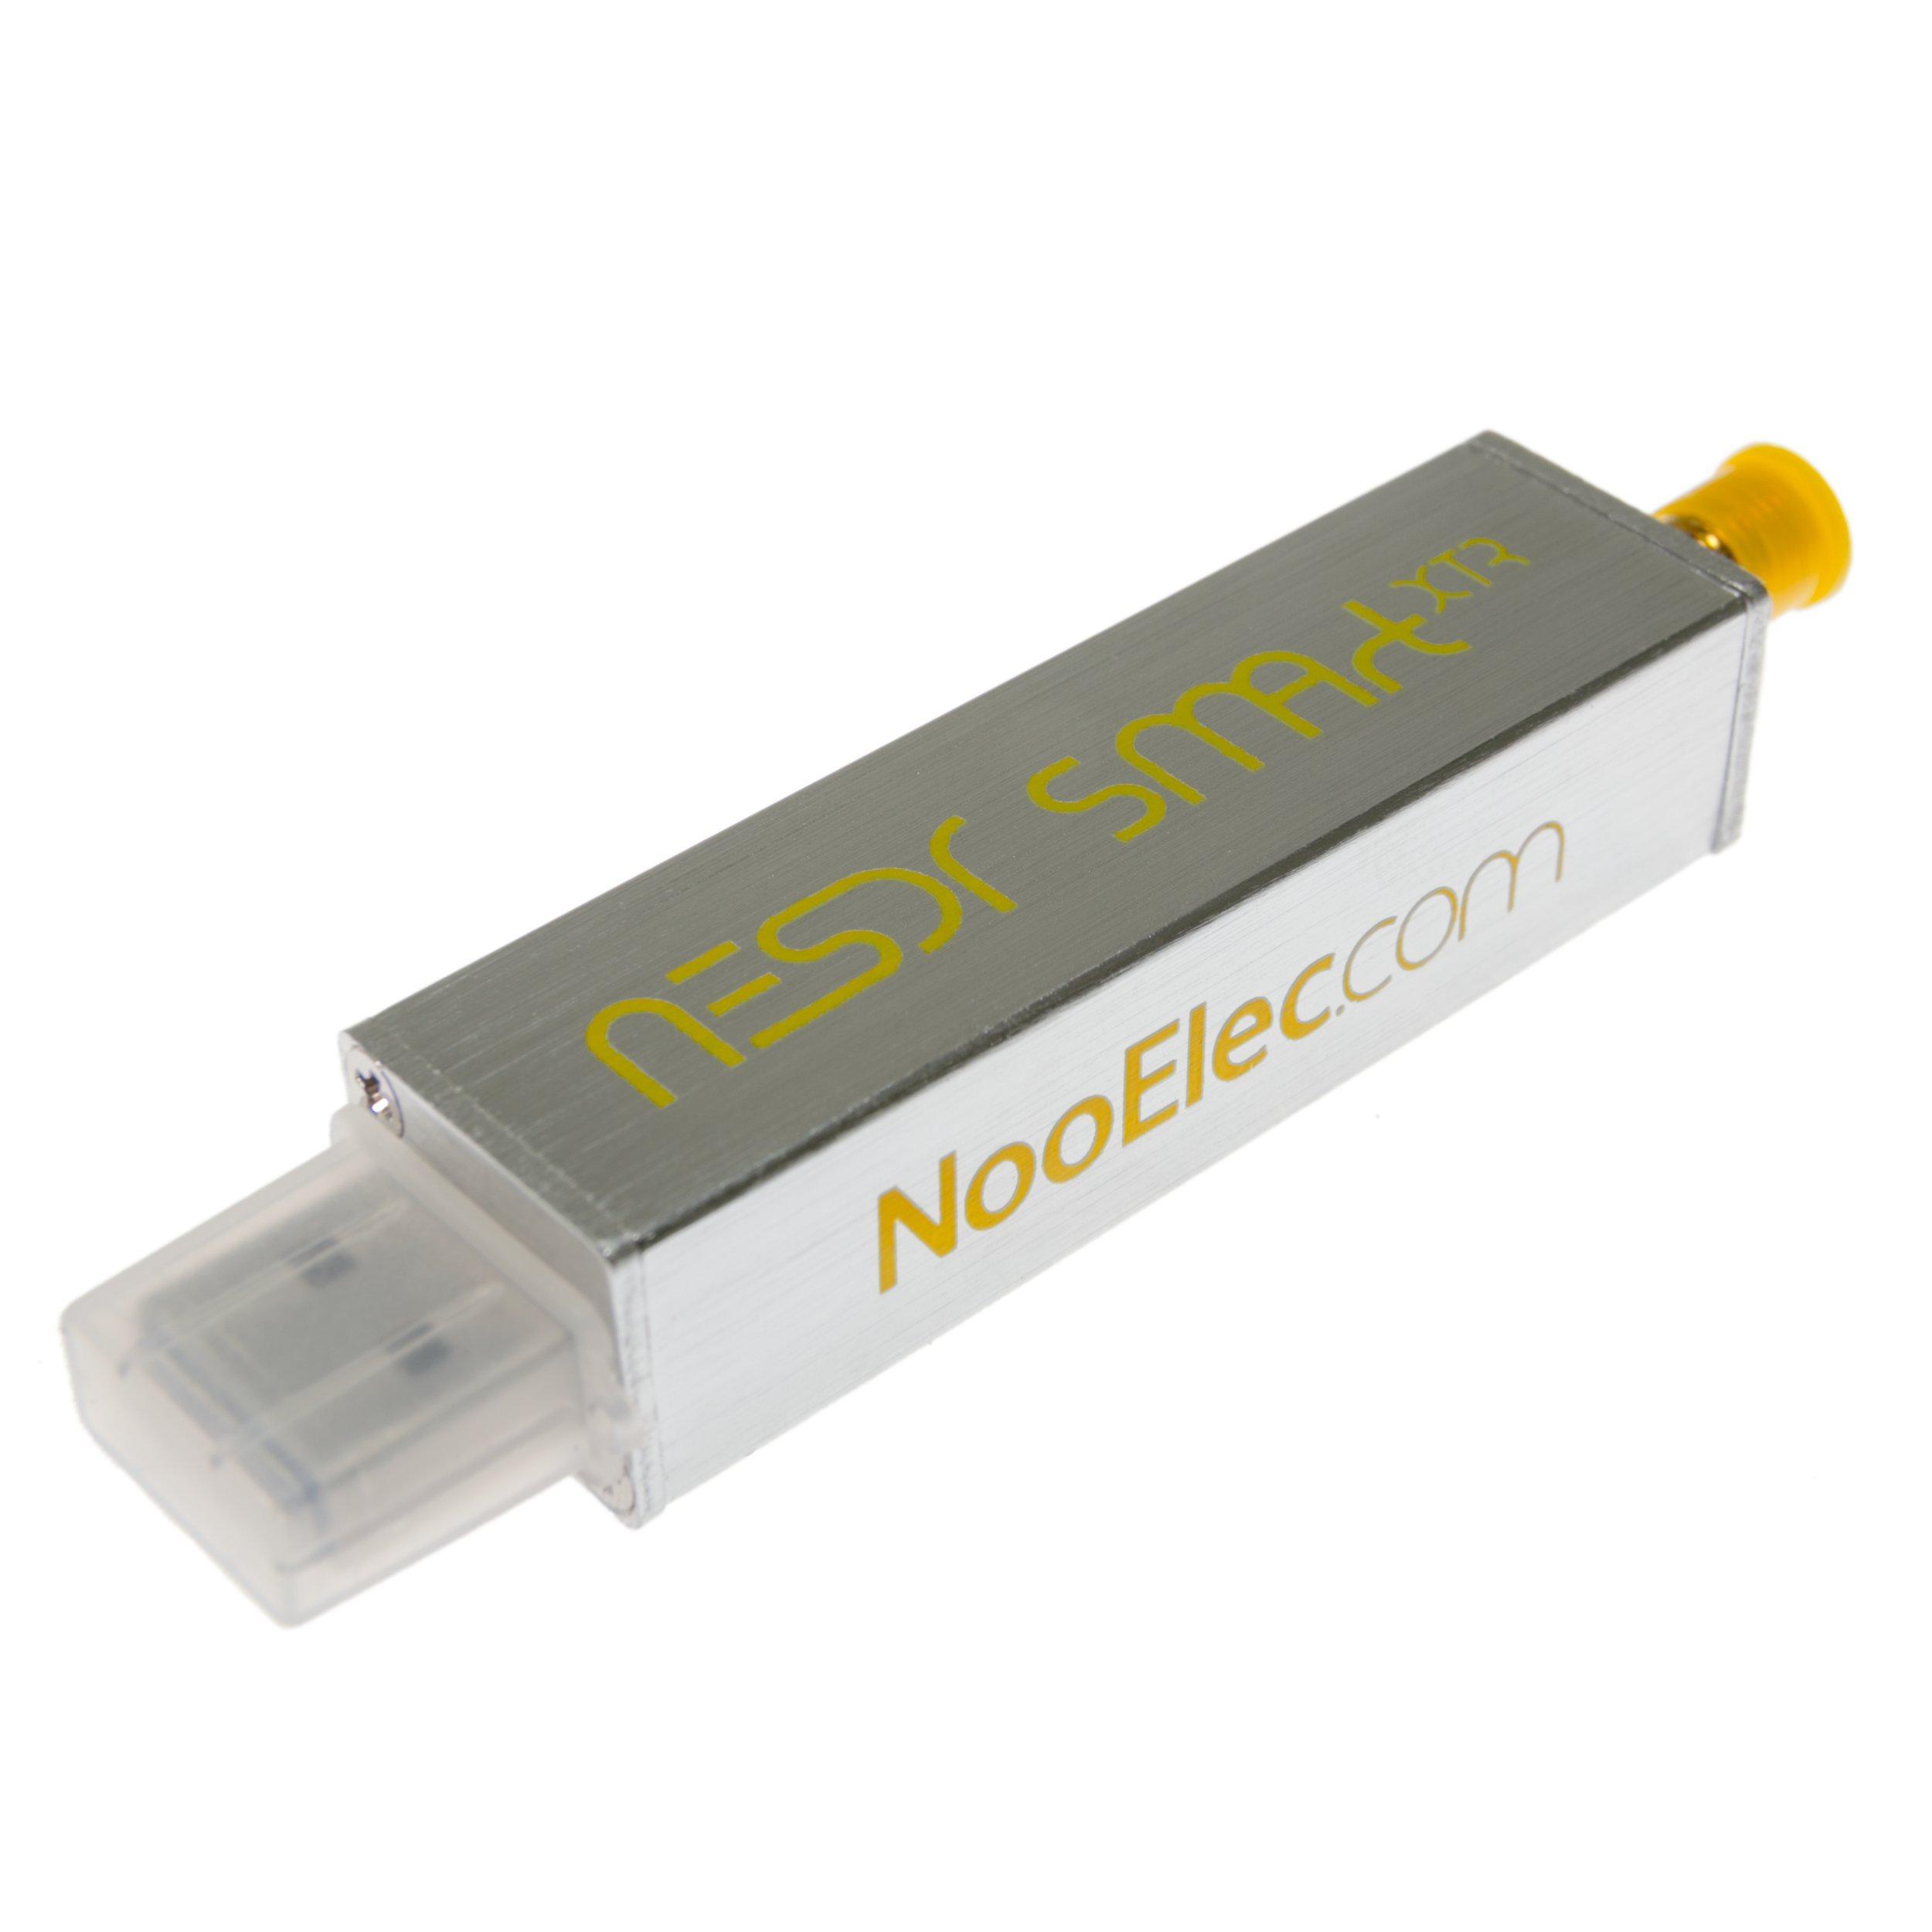 NooElec NESDR Smart XTR SDR - Premium RTL-SDR w/Extended Tuning Range, Aluminum Enclosure, 0.5PPM TCXO, SMA Input. RTL2832U & E4000-Based Software Defined Radio by NooElec